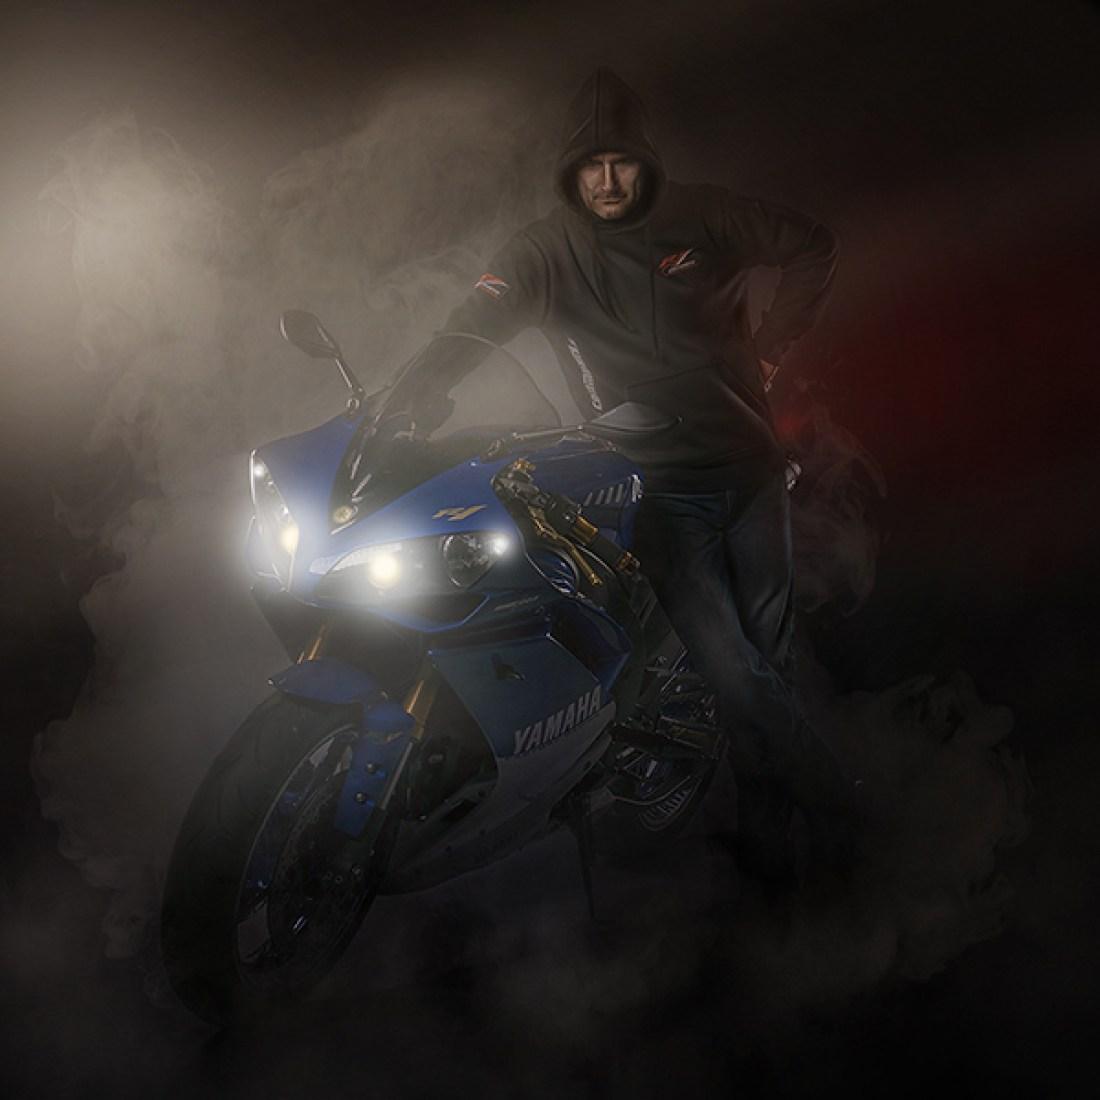 Motorrad Composing Boxen Lager Oschersleben Allmie